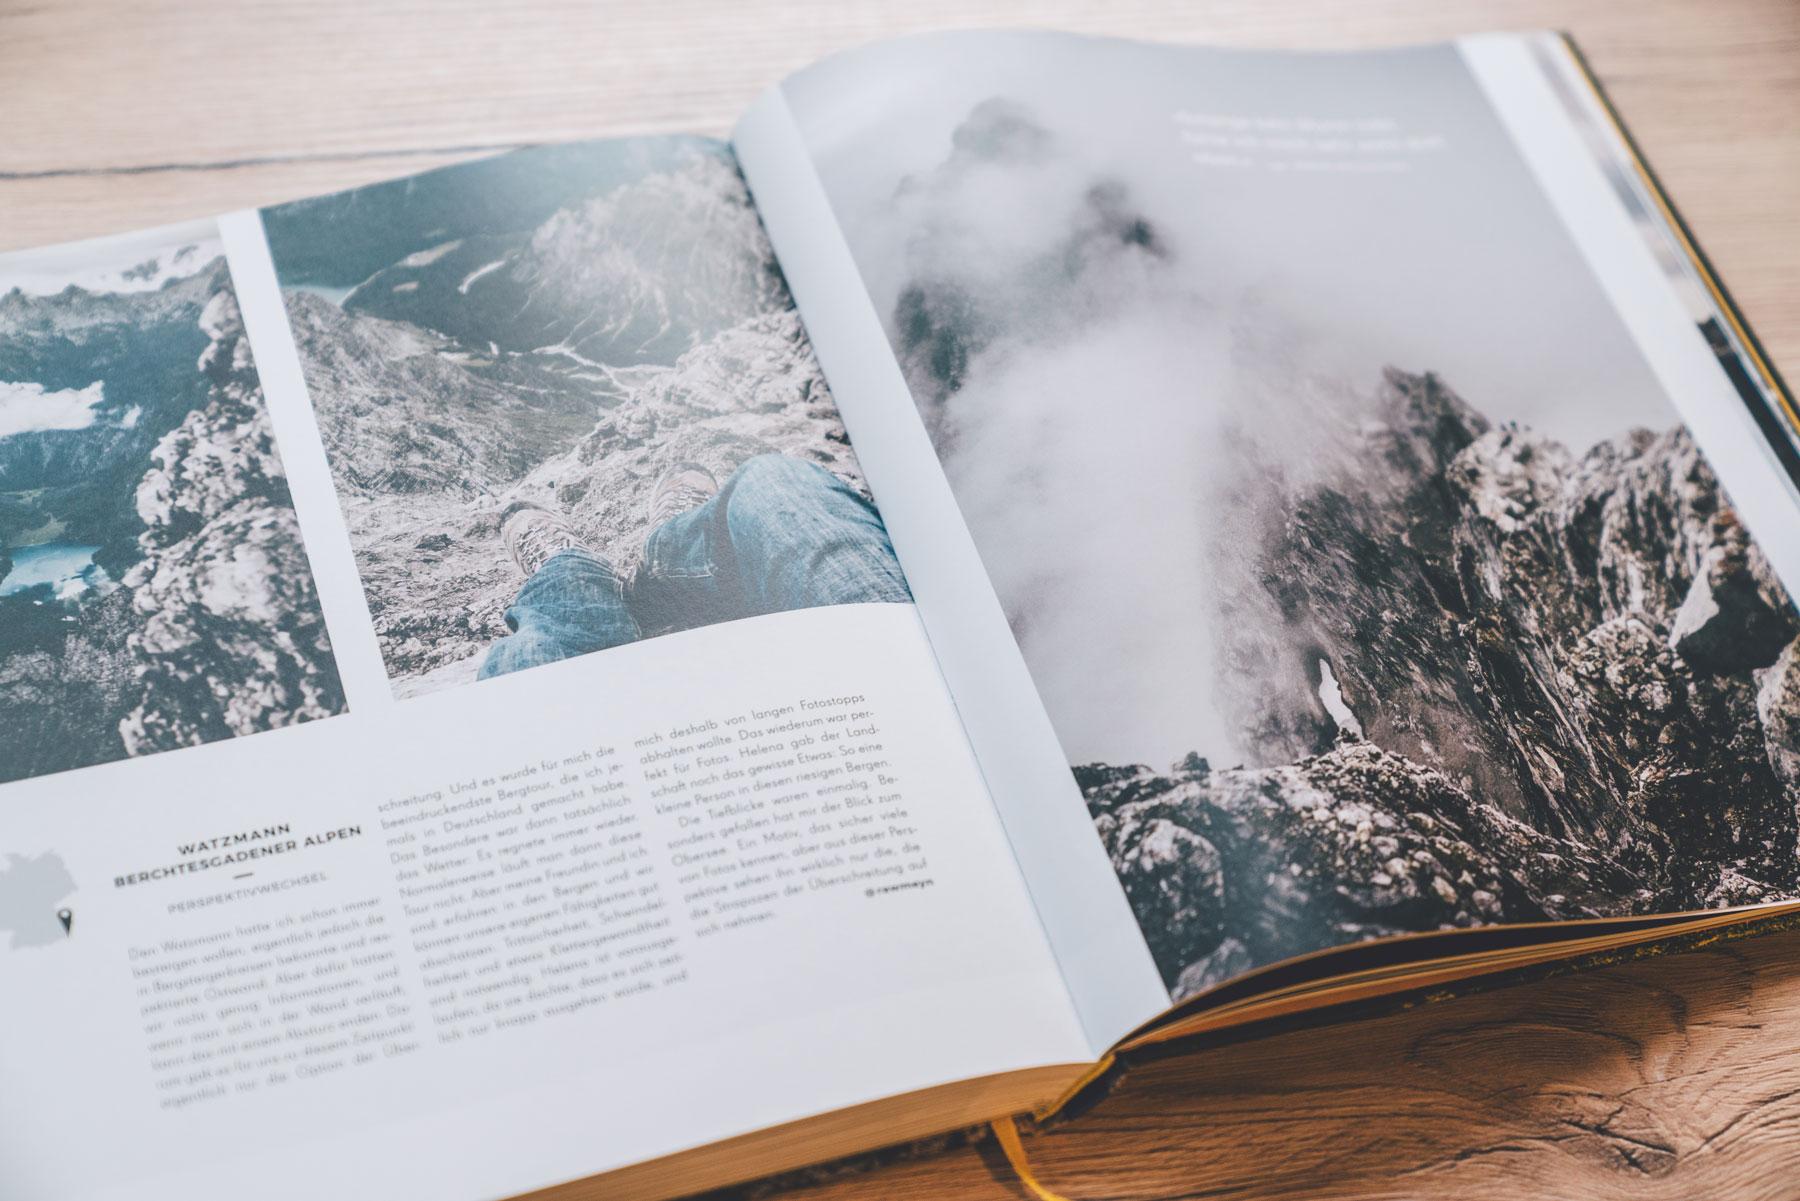 RomanKoenigshofer_Germanroamers_Book_Photographer_Outdoor_DSC04775